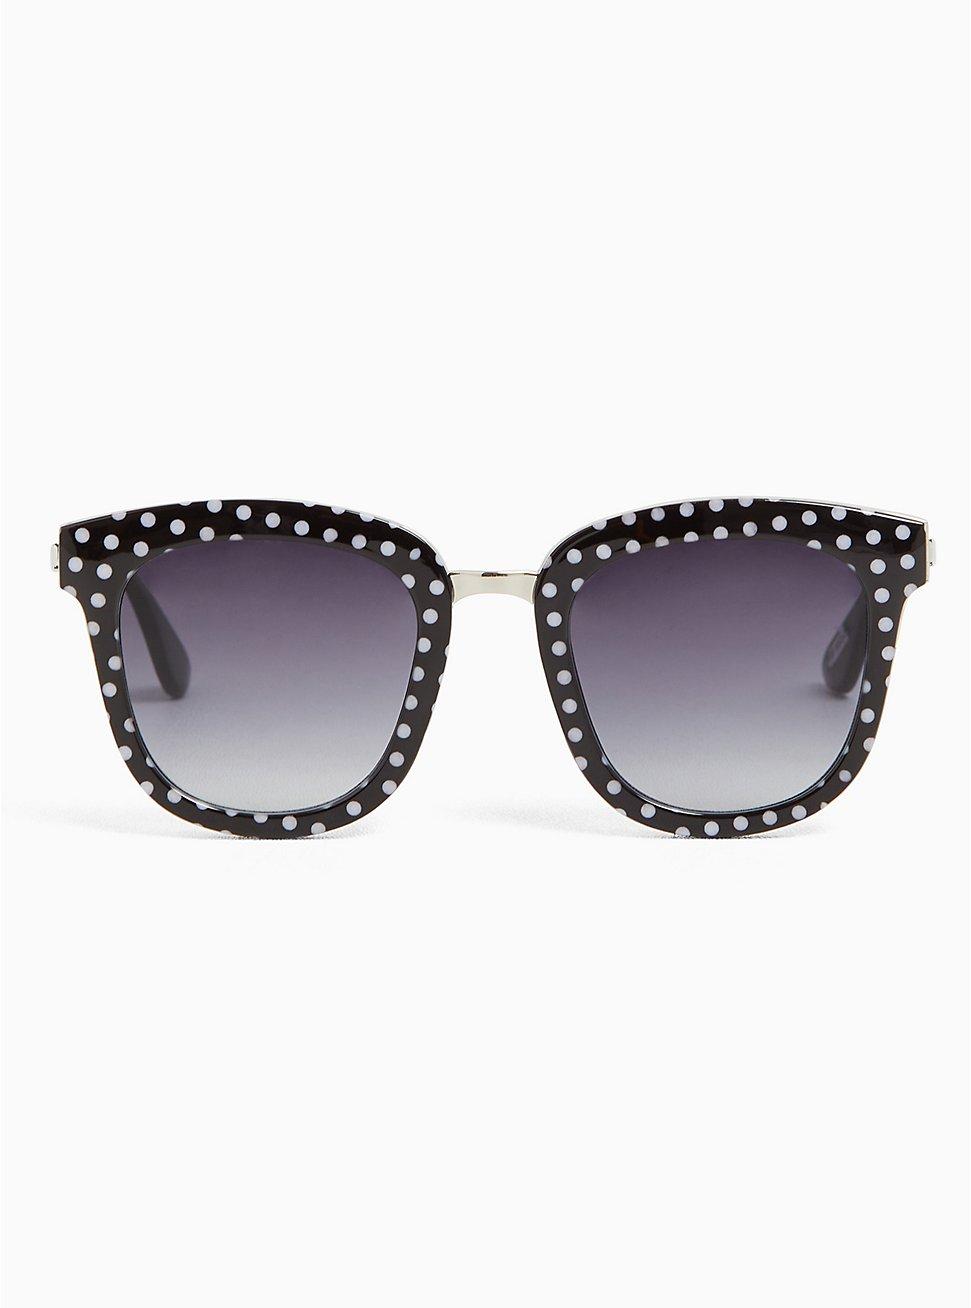 Black & White Polka Dot Cat Eye Sunglasses, , hi-res